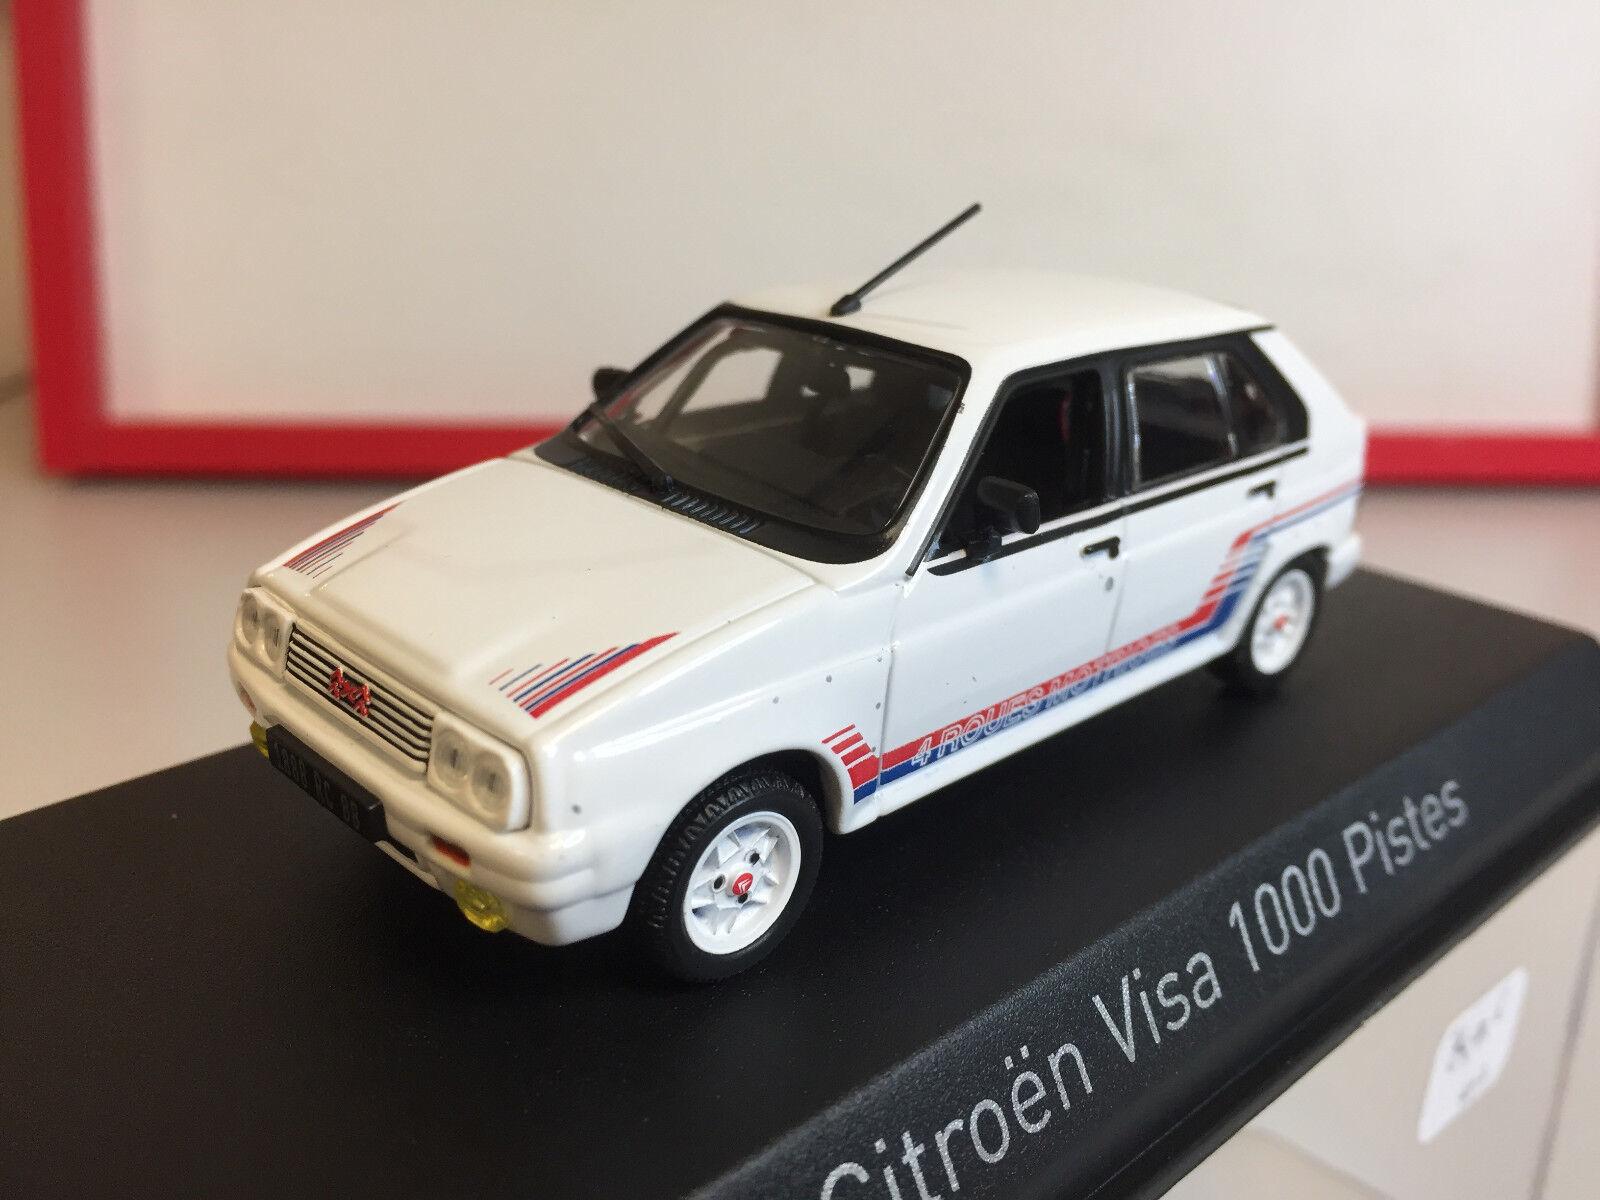 Norev Citroën Visa 1000 Pistes 1983 1 43 150941